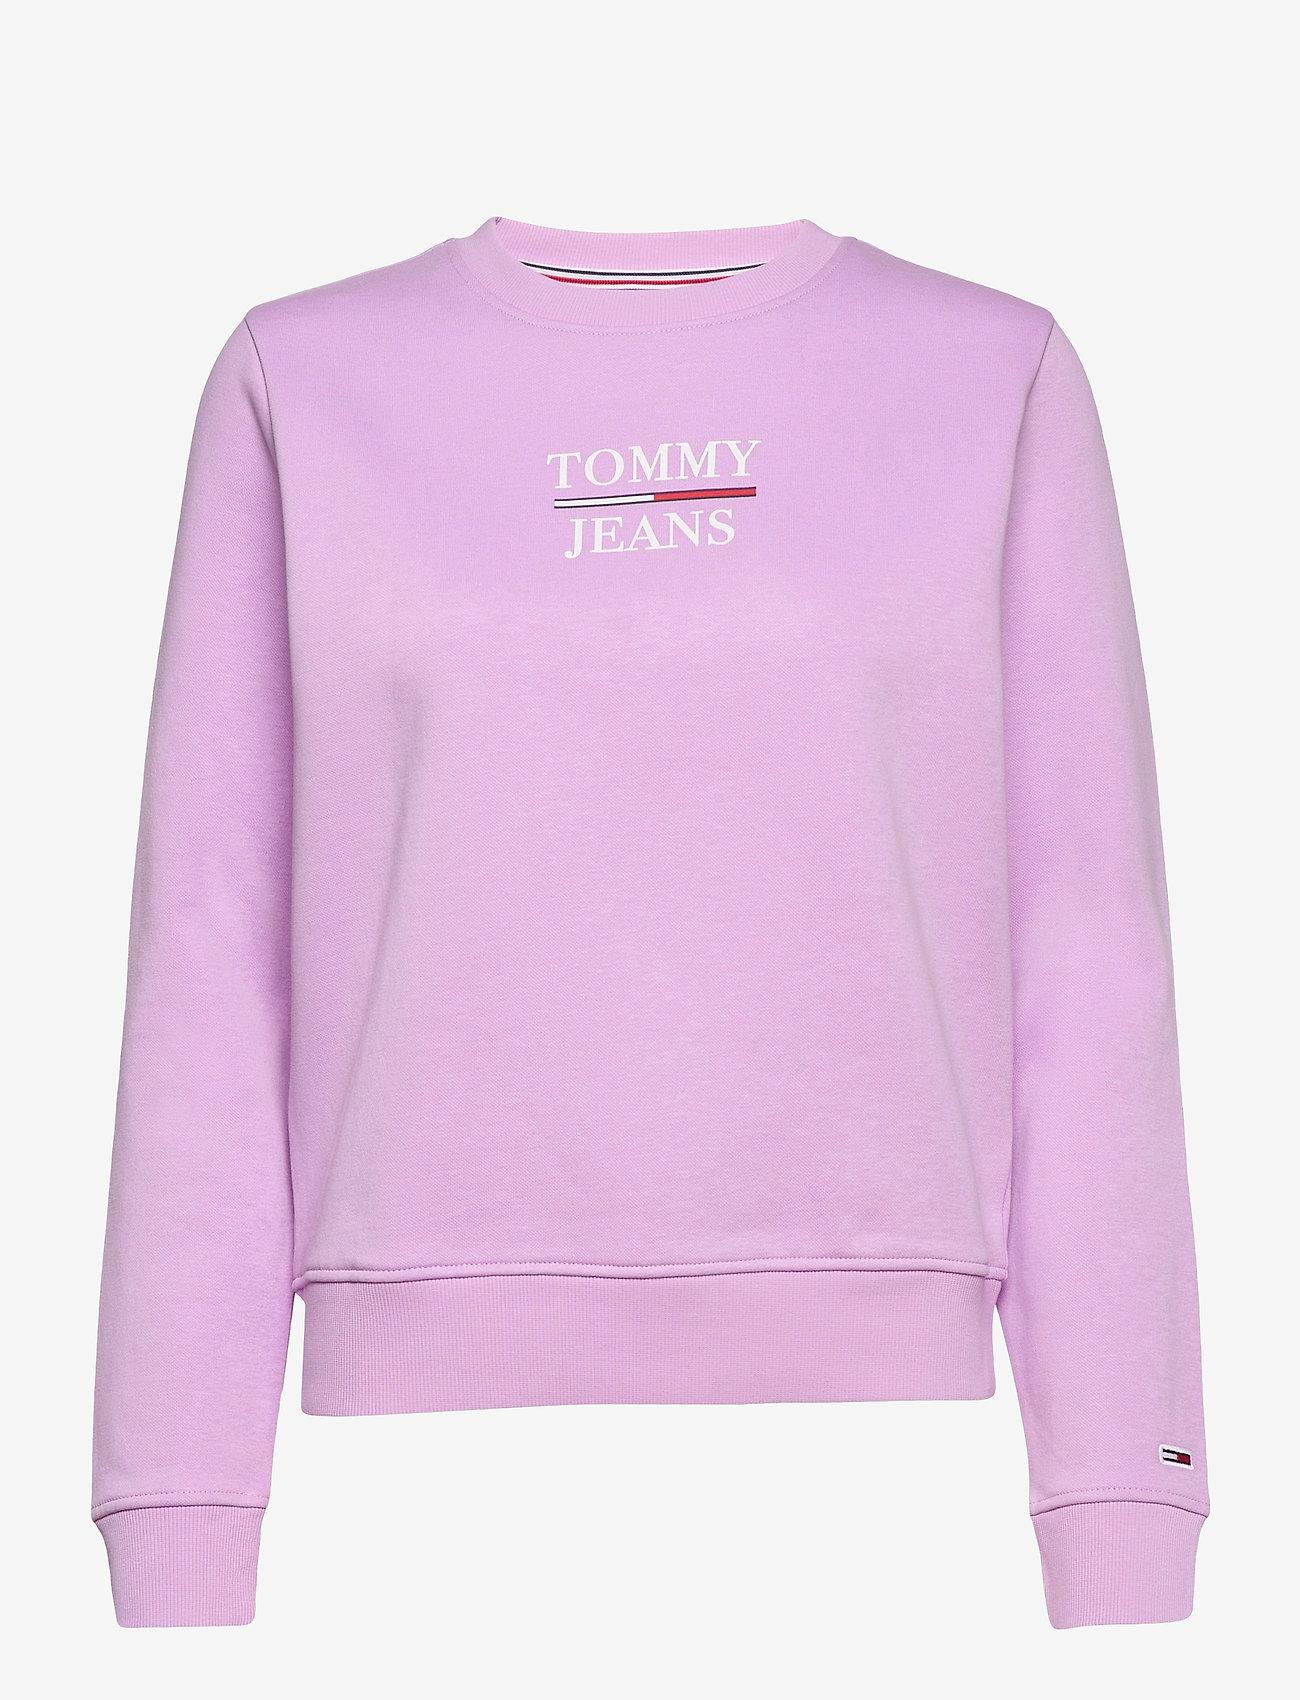 Tommy Jeans - TJW SLIM LOGO CREW - sweatshirts & hoodies - fresh orchid - 0